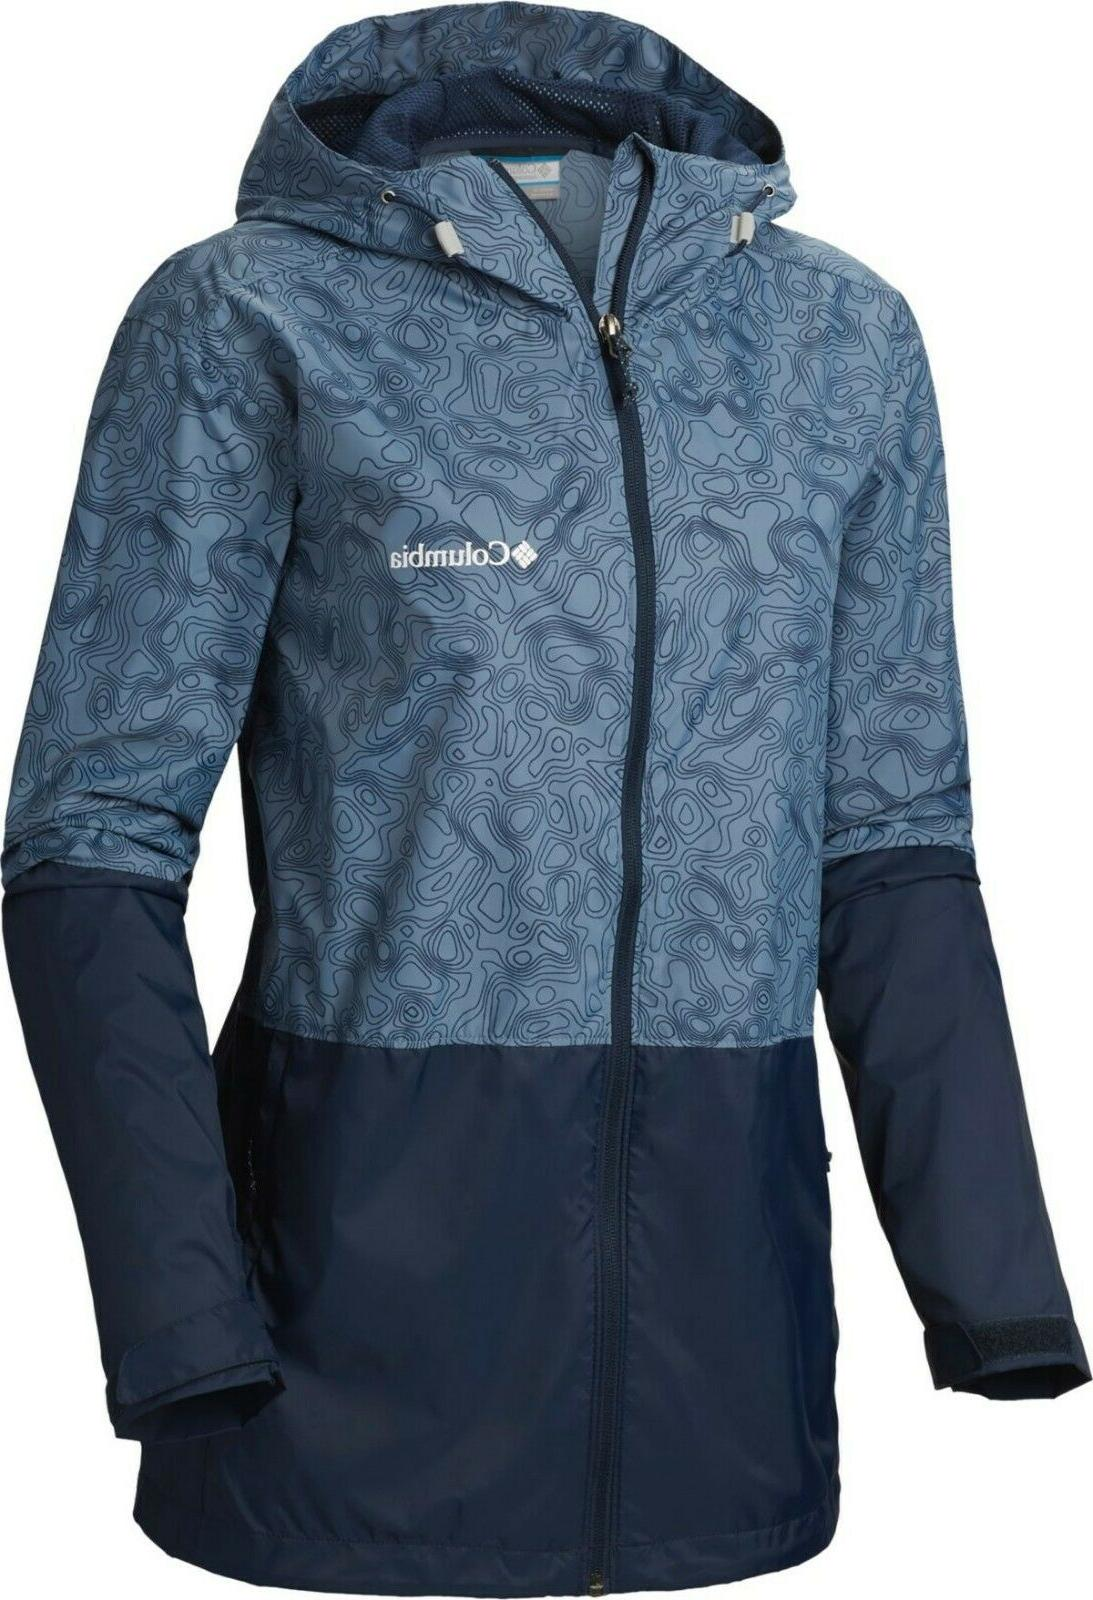 new mens roan mountain rain jacket